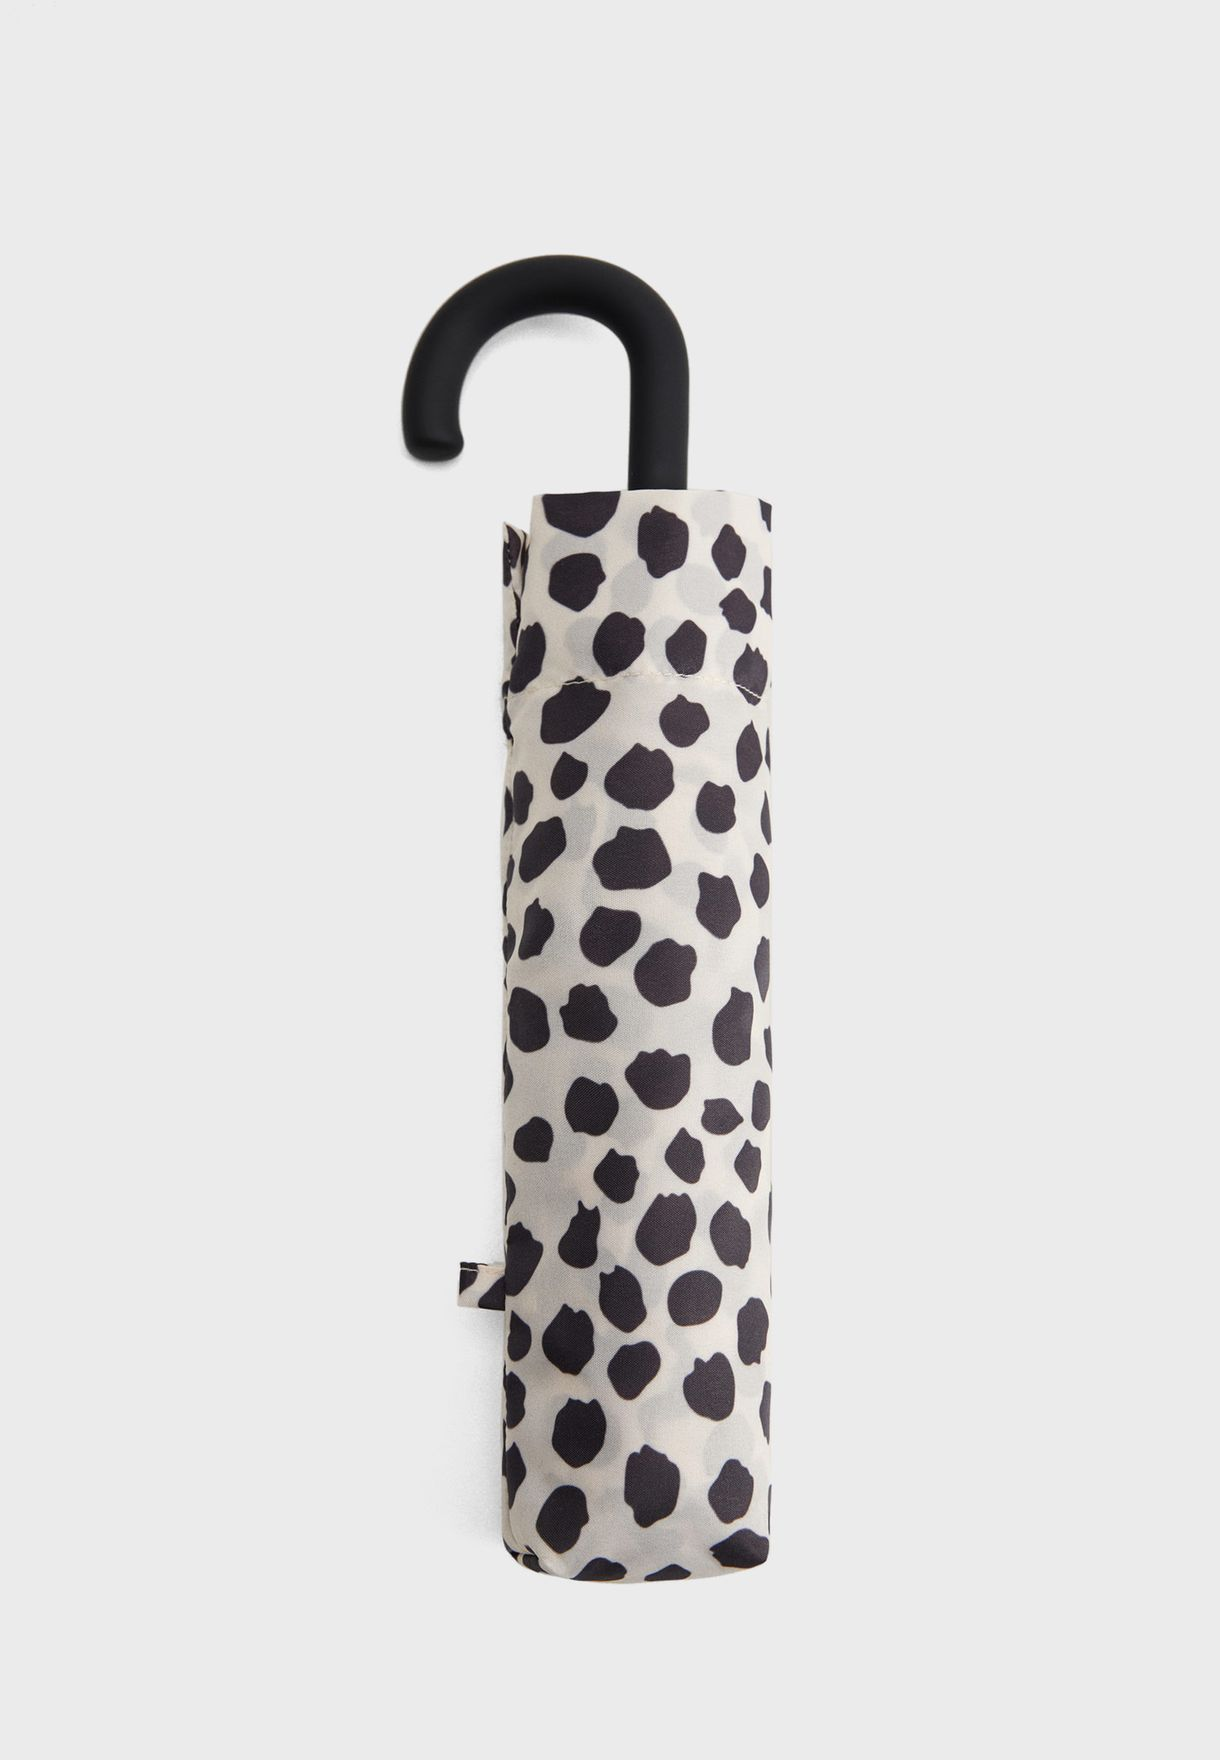 Blanca Polka-Dot Folding Umbrella